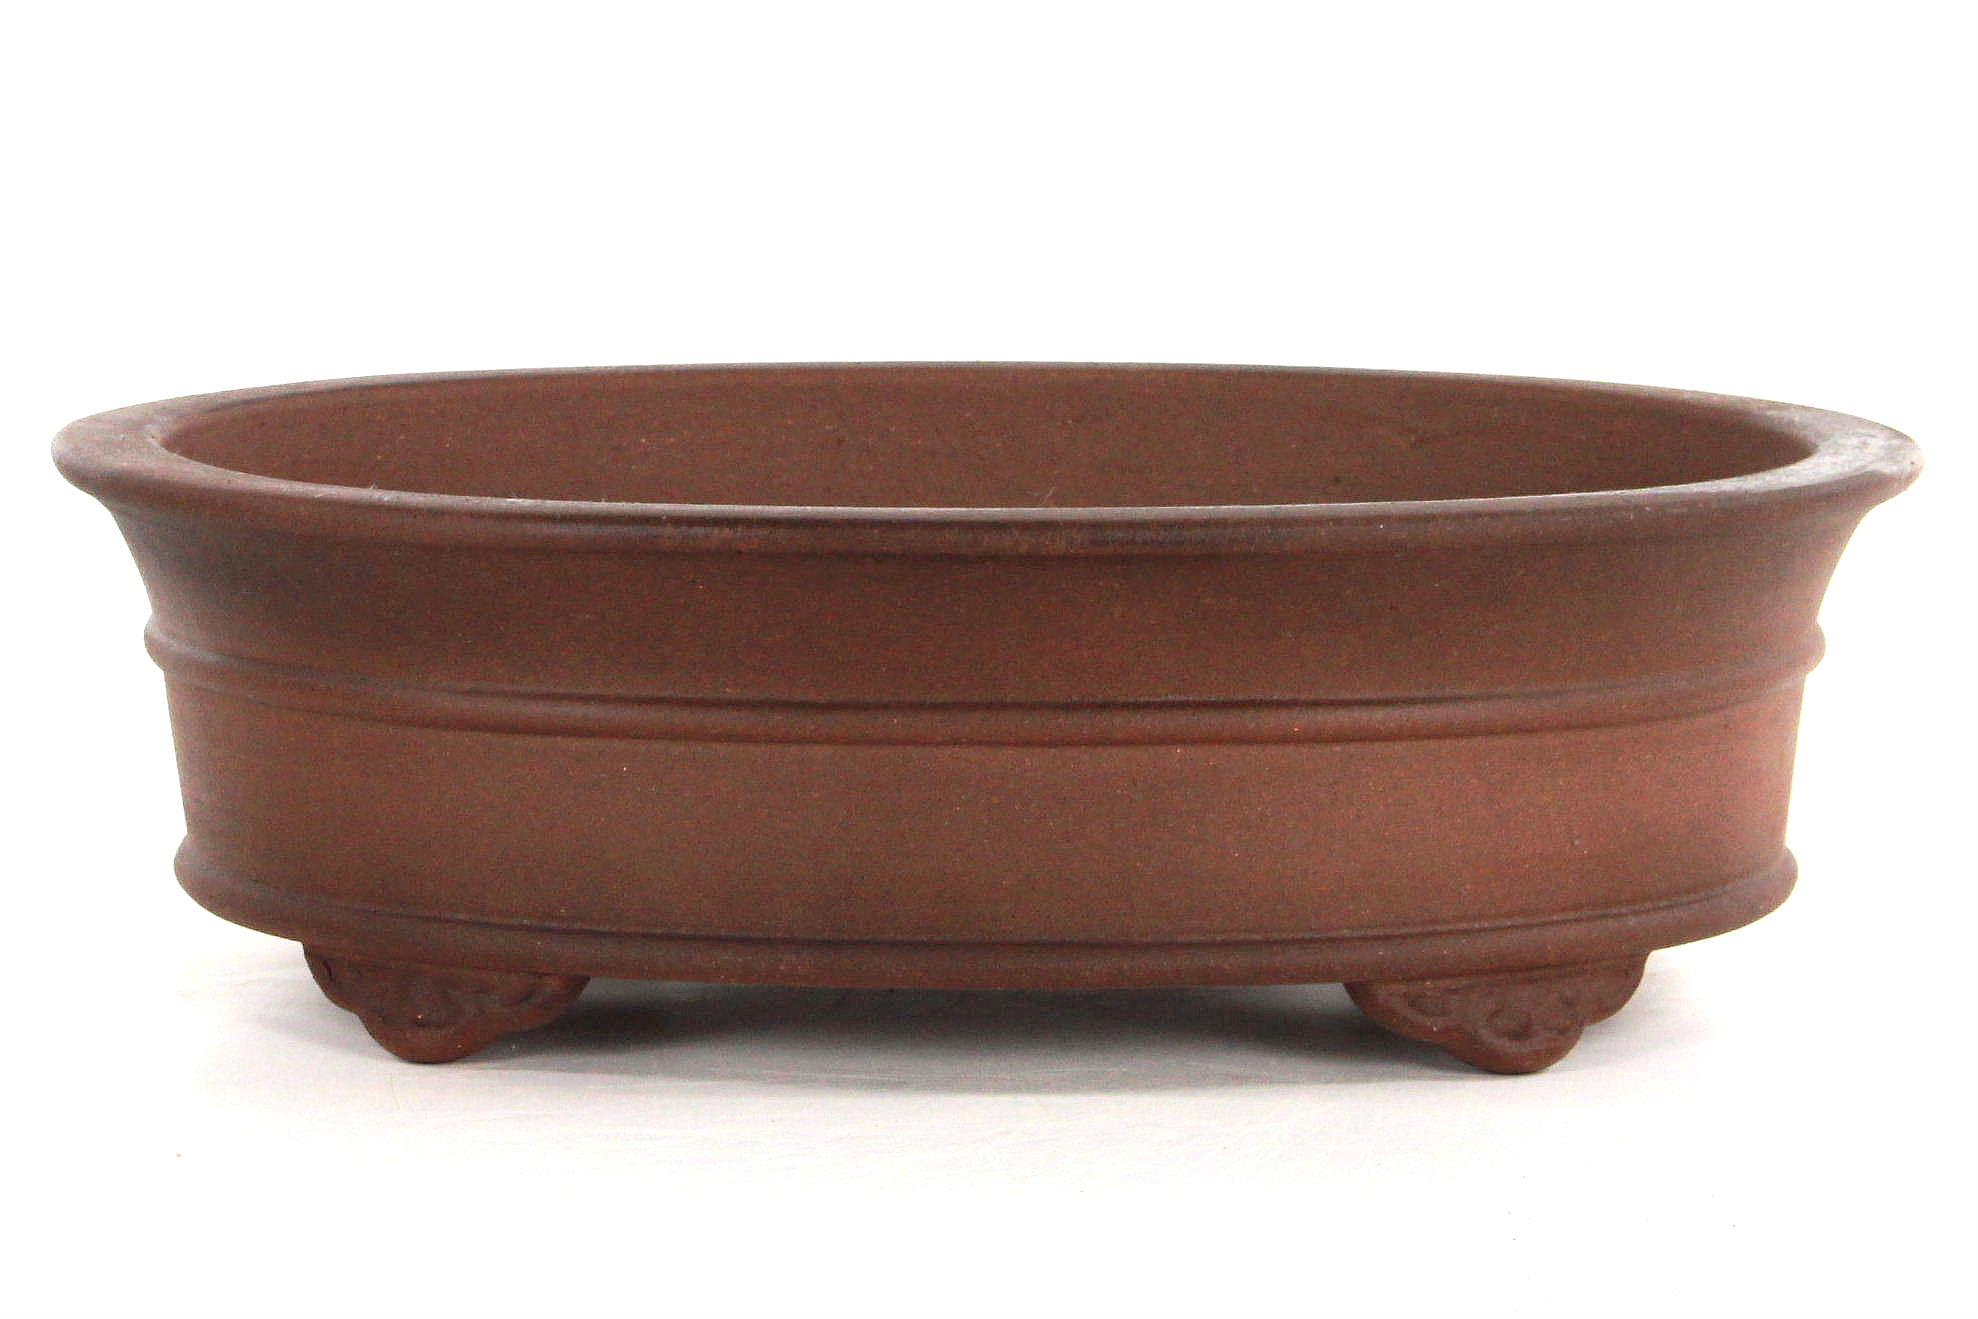 Bonsai schale 42x33x12 antik braun bei oyaki bonsai kaufen for Bonsai versand